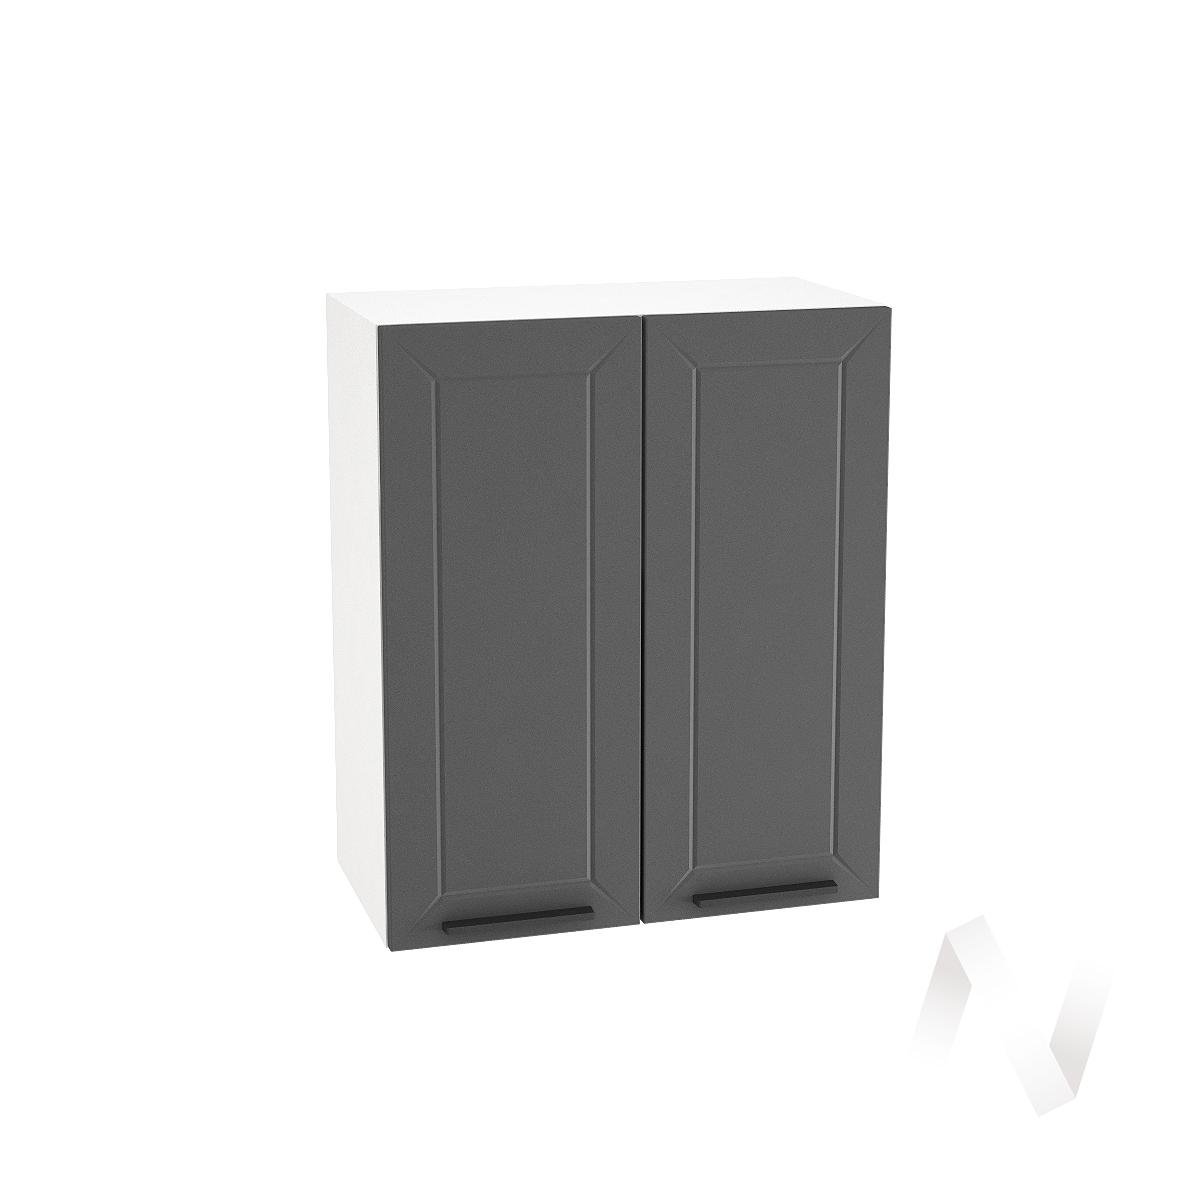 "Кухня ""Глетчер"": Шкаф верхний 600, ШВ 600 (Маренго силк/корпус белый)"